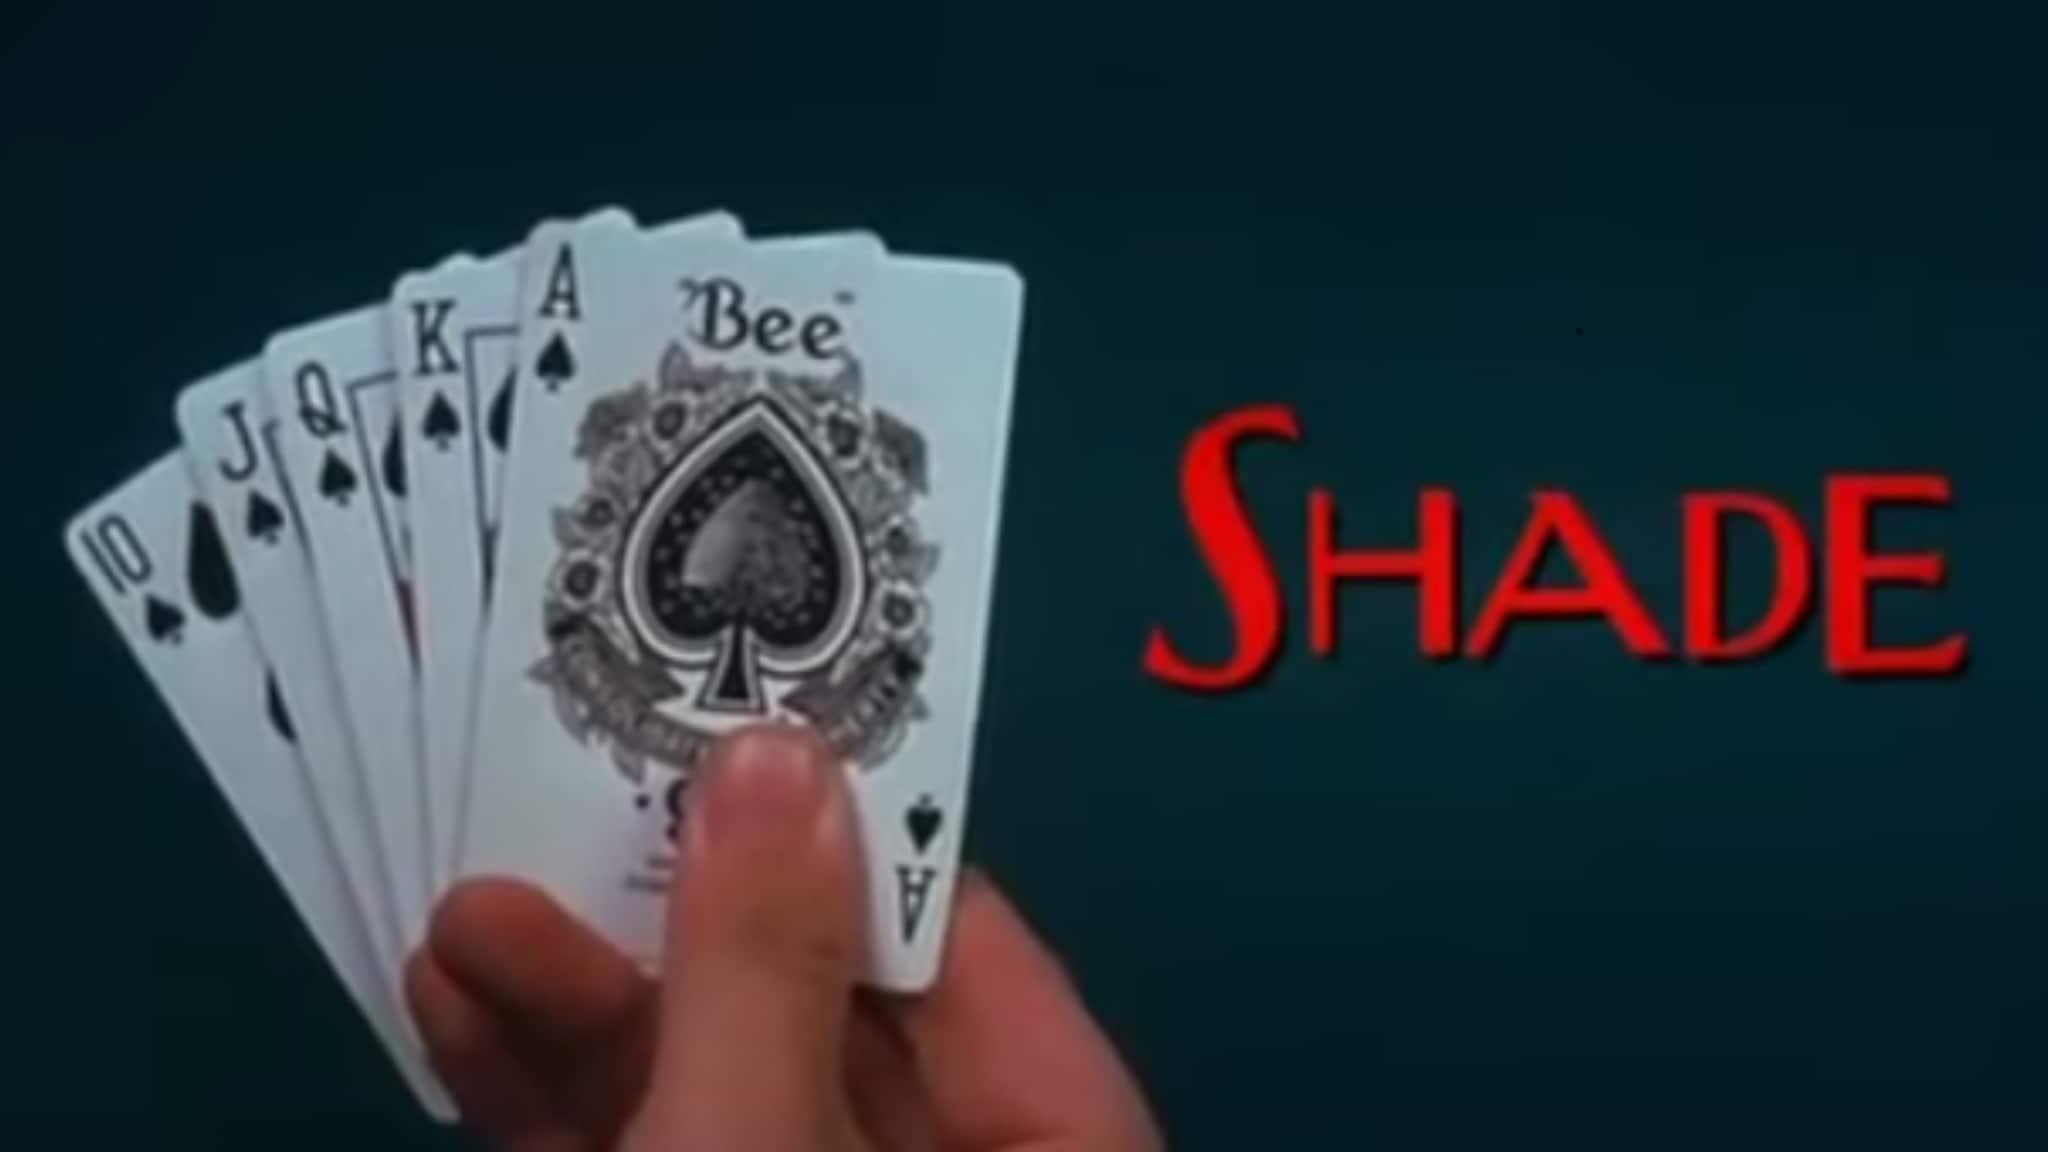 Rai Movie Shade - Carta vincente